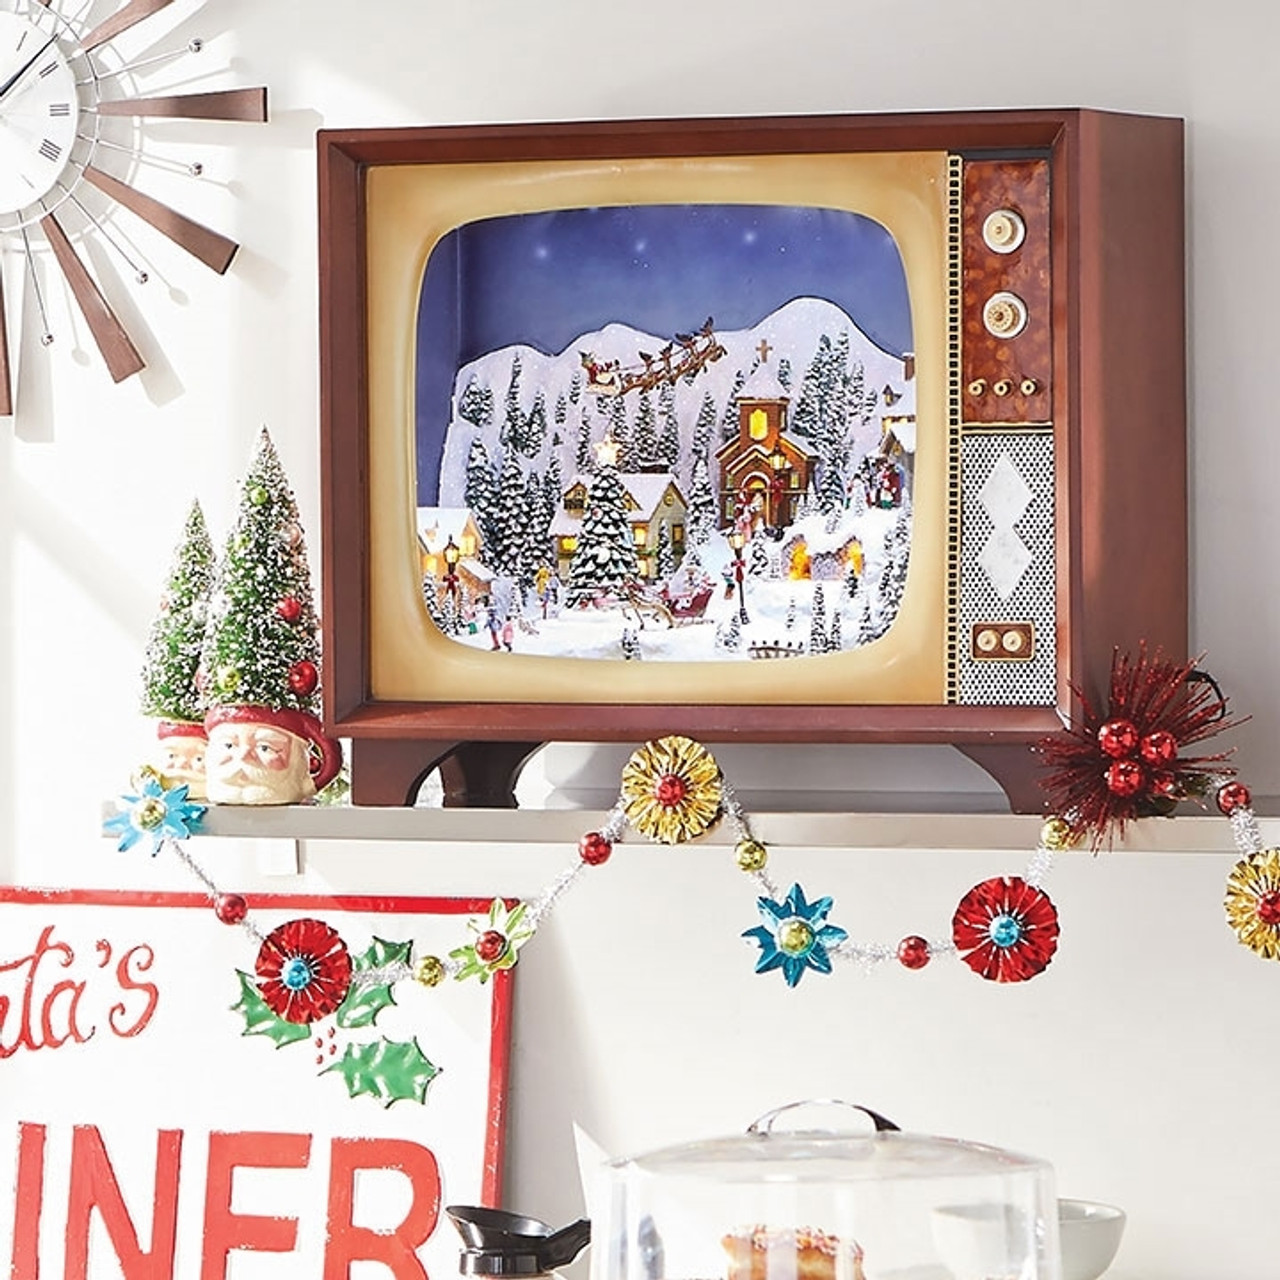 Raz 23 Besar Animated Musical Lighted Retro Tv Dengan Village Scene Raz Imports Raz Christmas Christmas Figure Lighted Christmas Decoration Animasi Christmas Decoration